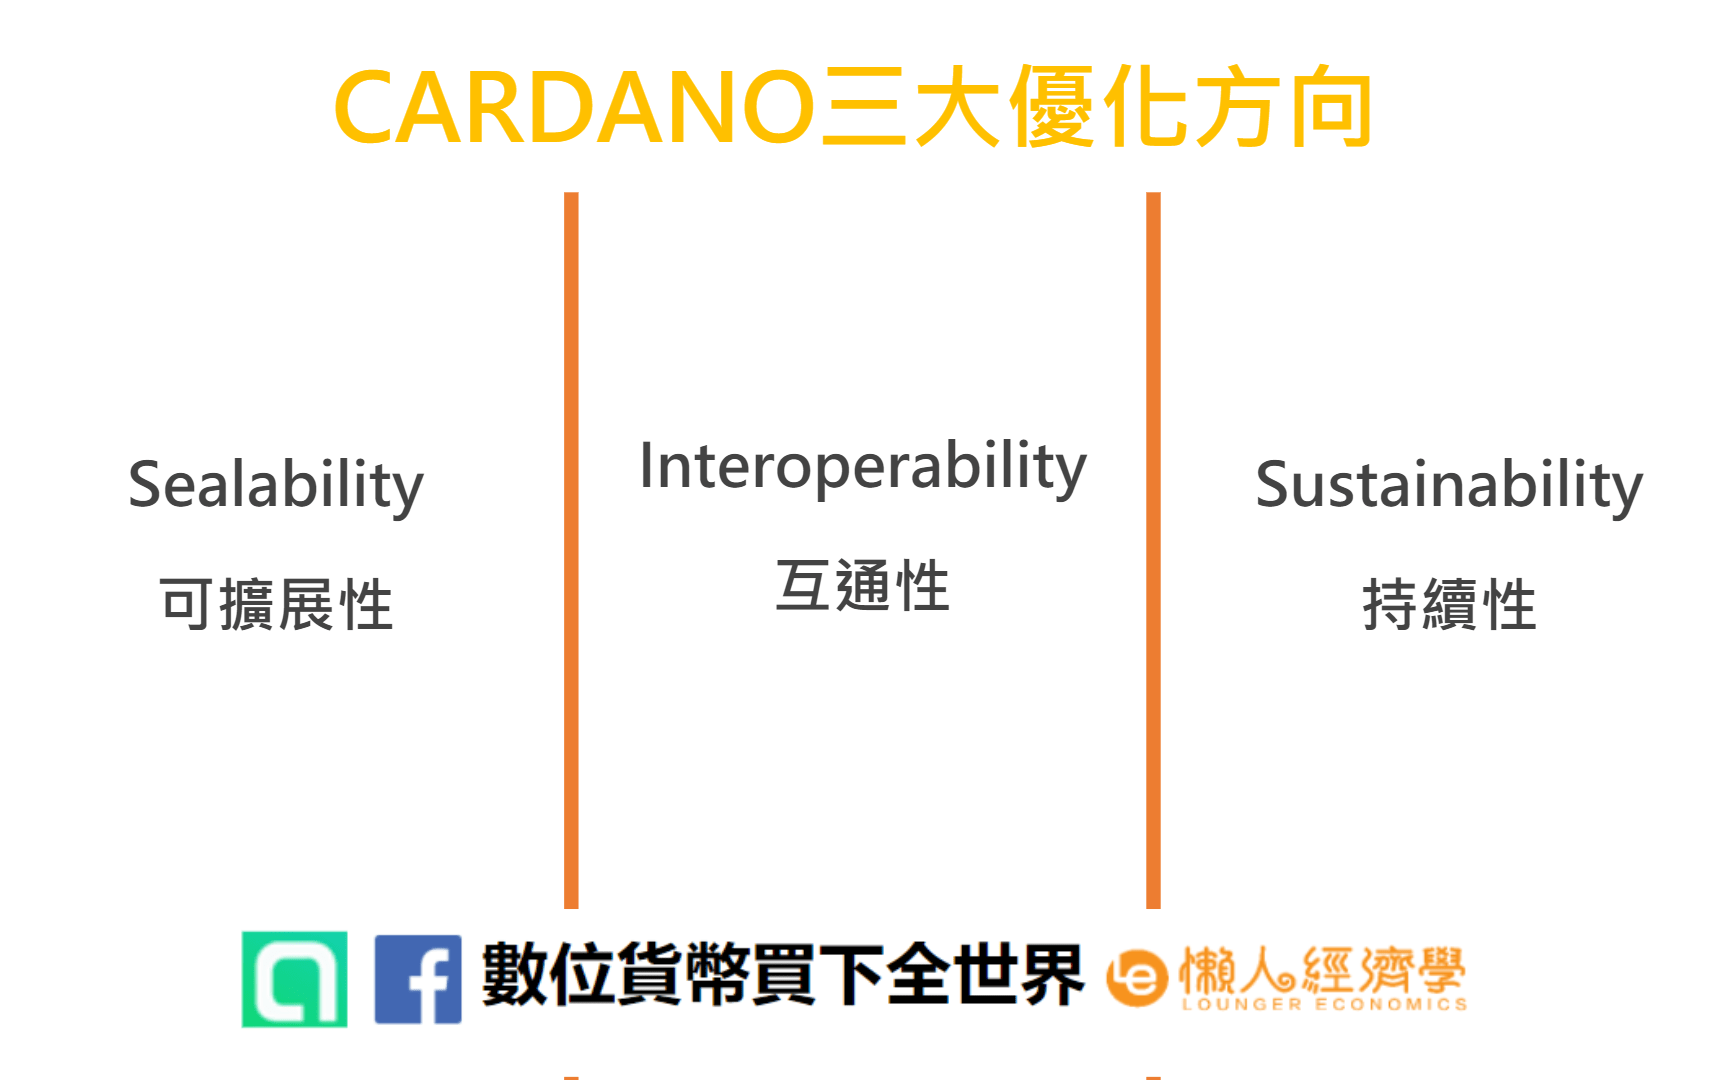 Cardano(ADA幣,又名艾達幣)三大優化方向:擴展性、互通性、持續性